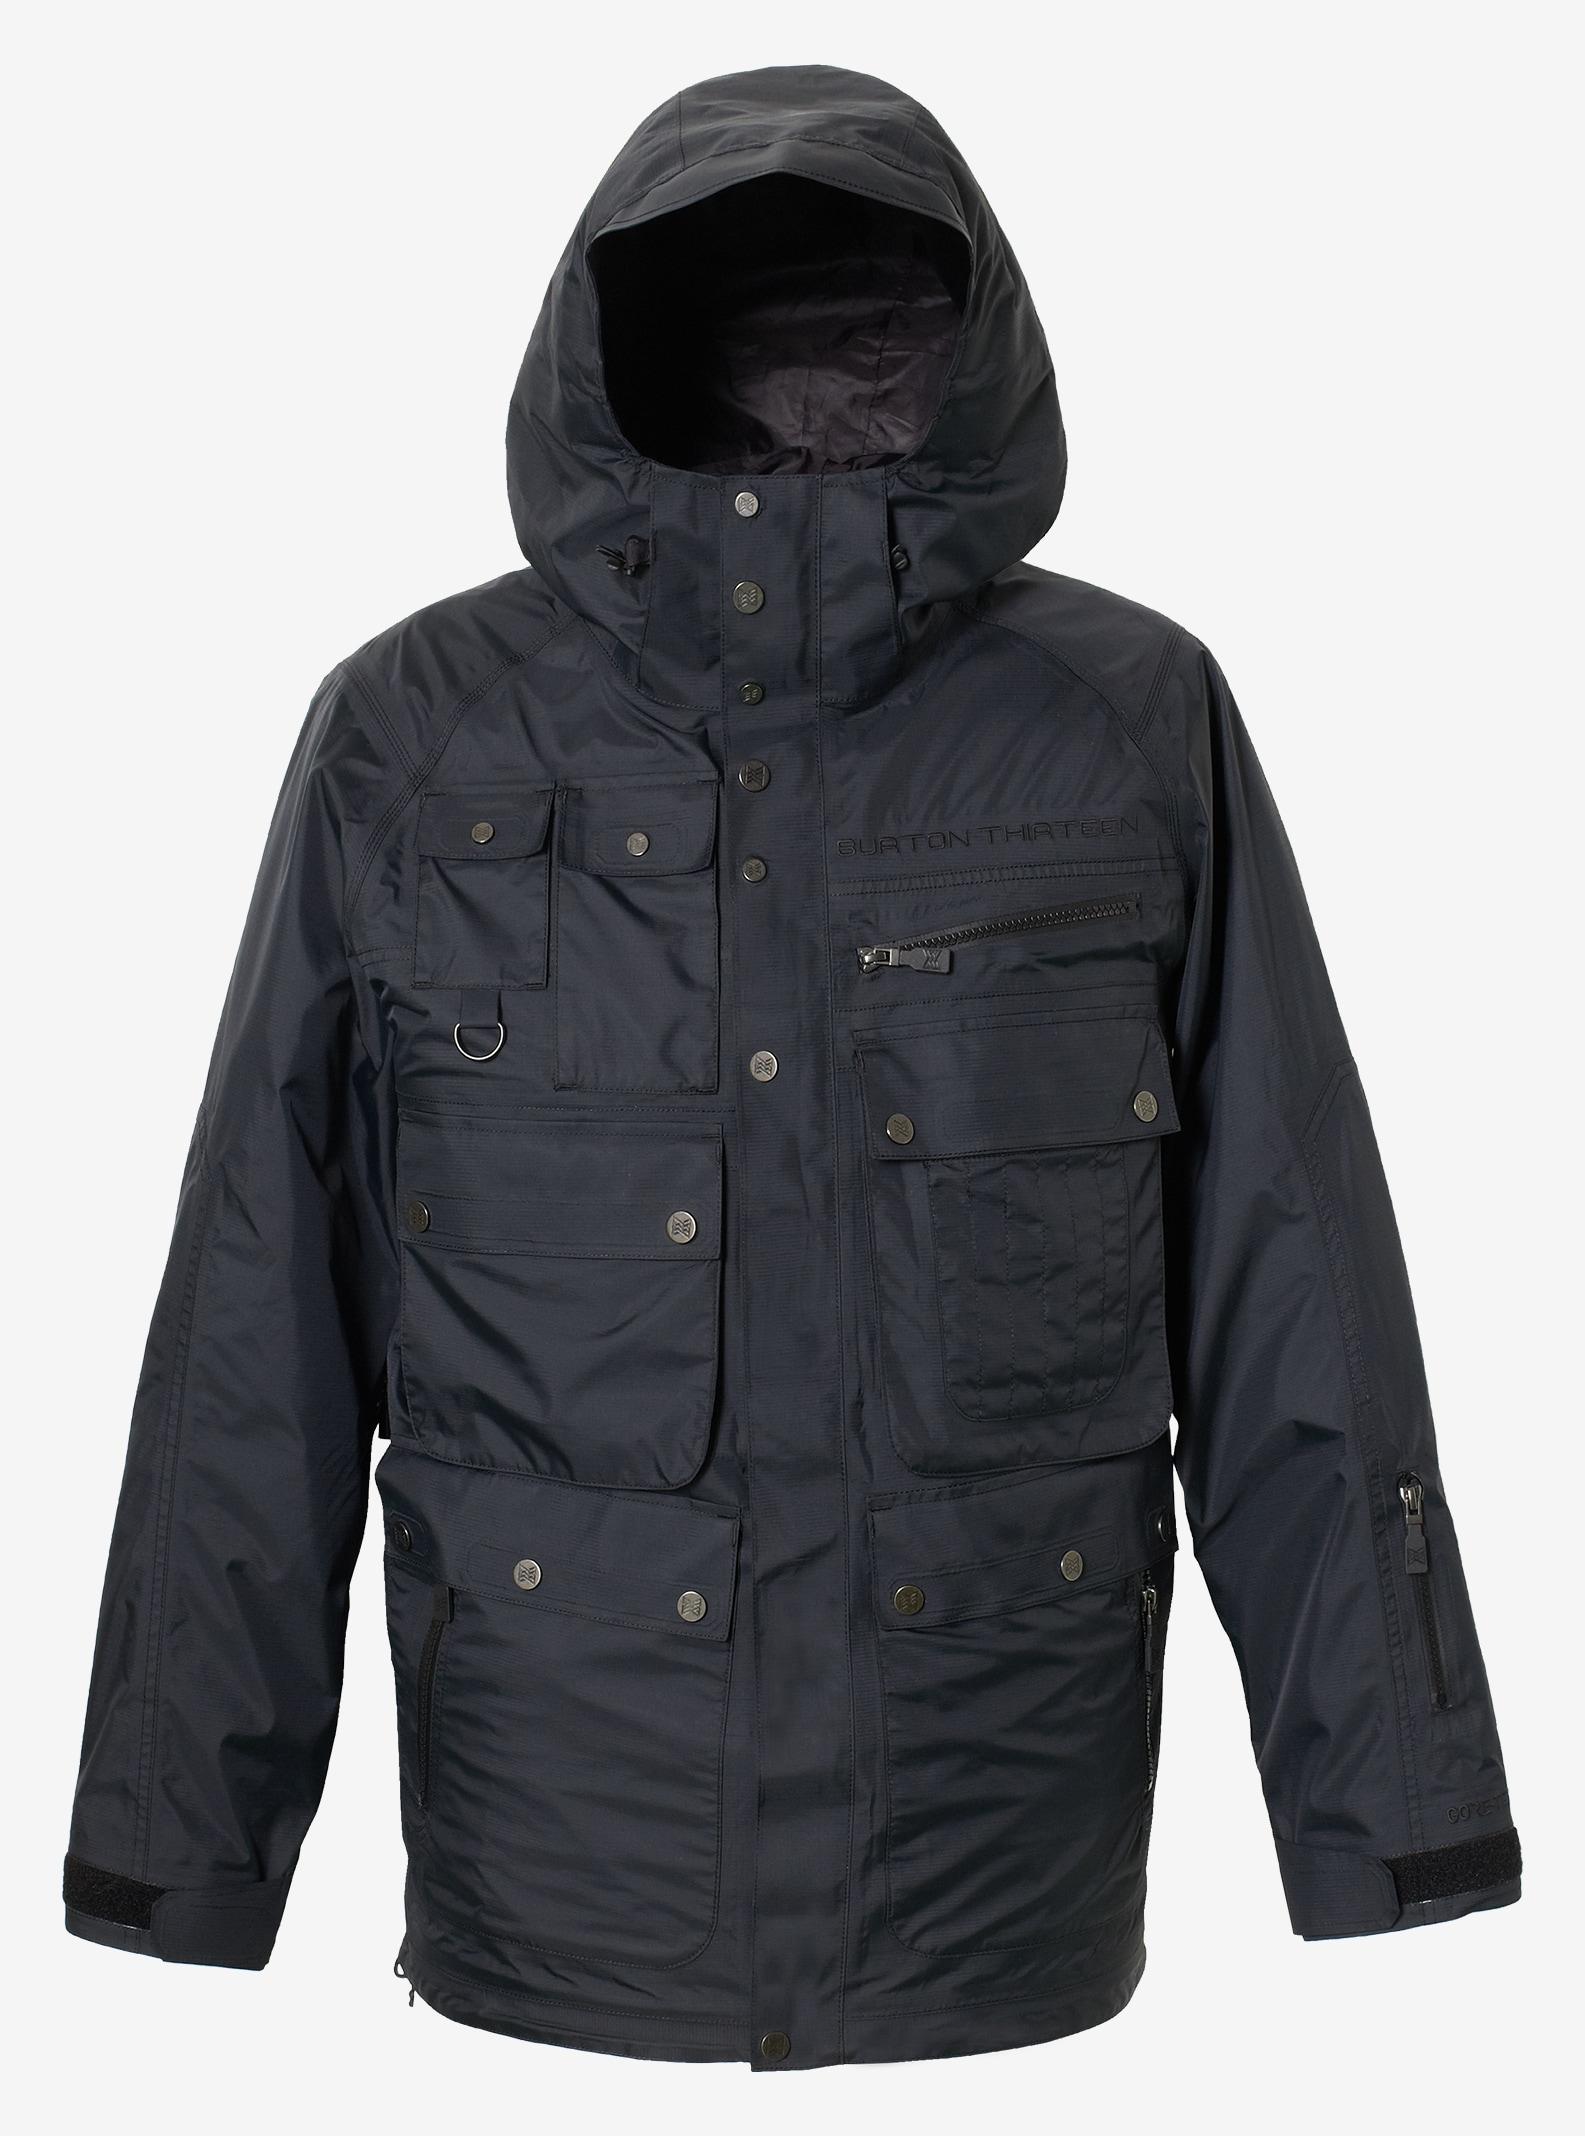 Men's Burton THIRTEEN Bardem Jacket shown in True Black